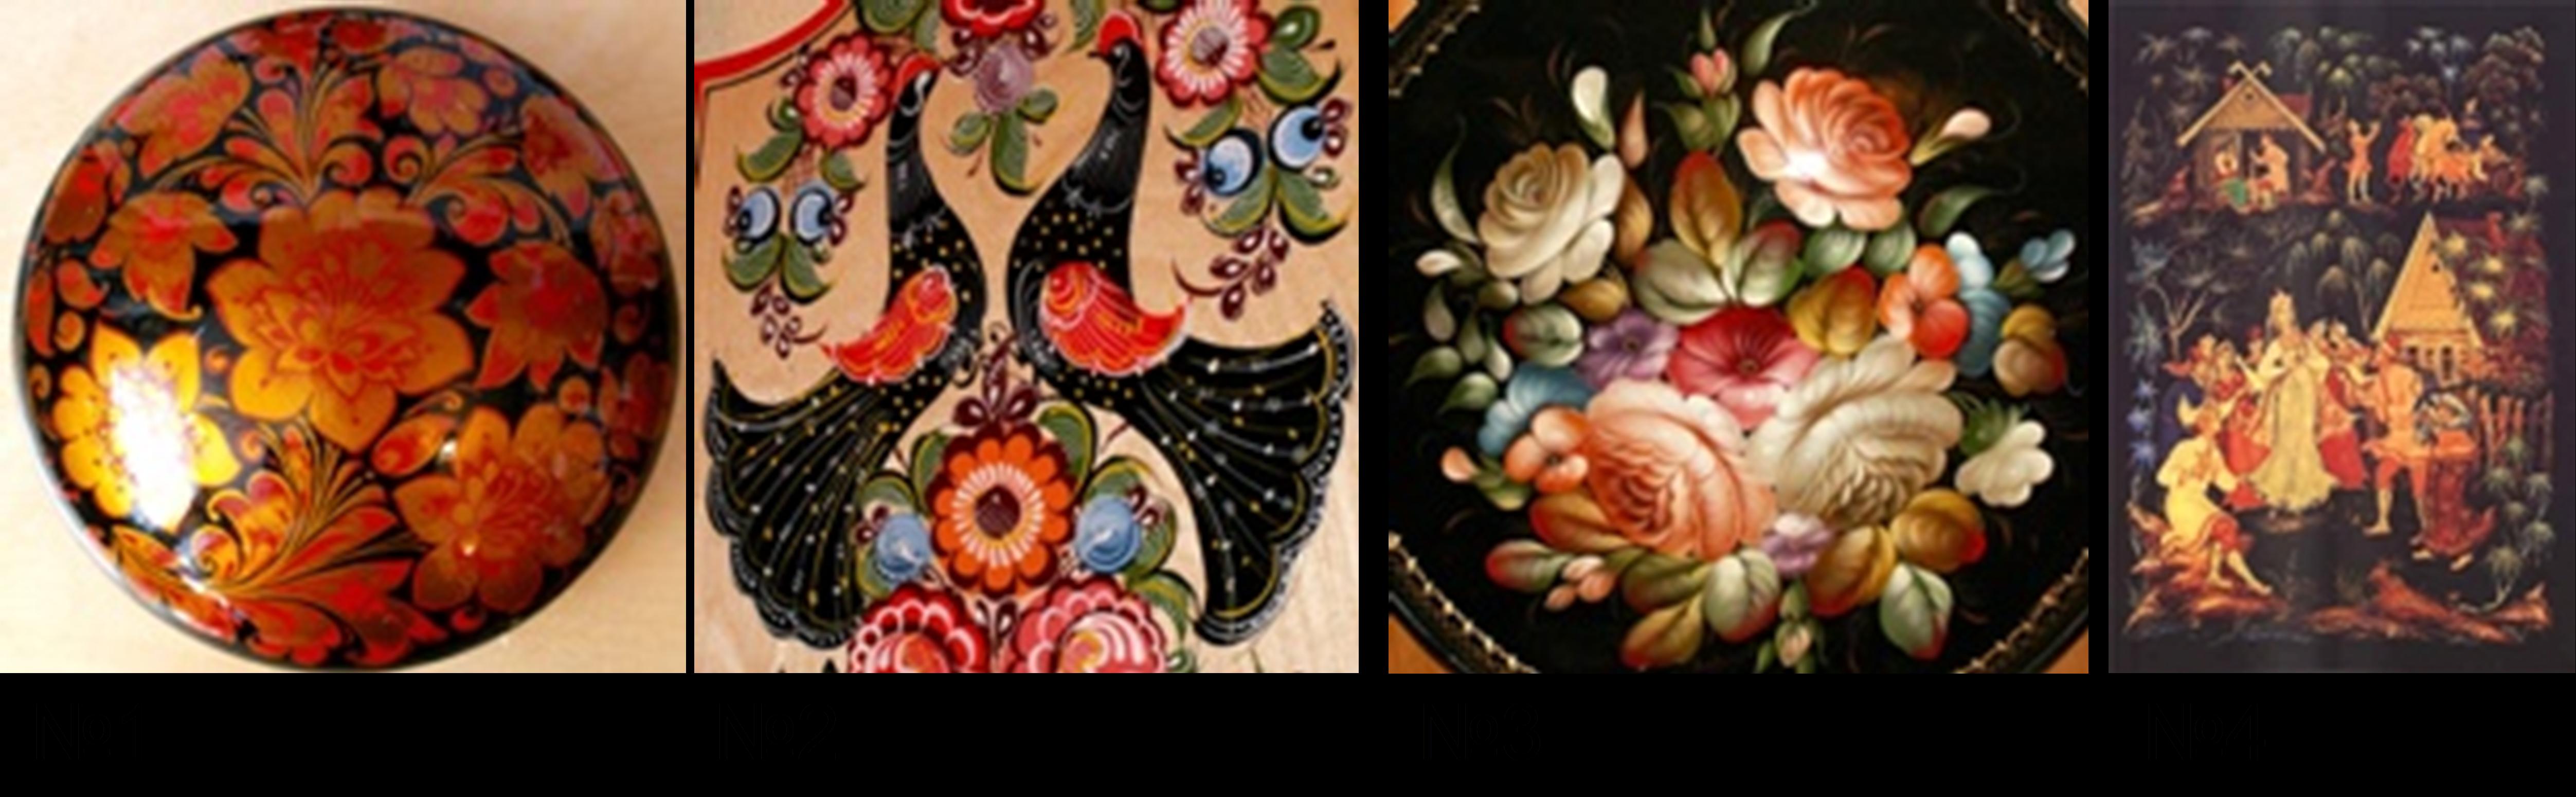 Декоративная кистевая роспись